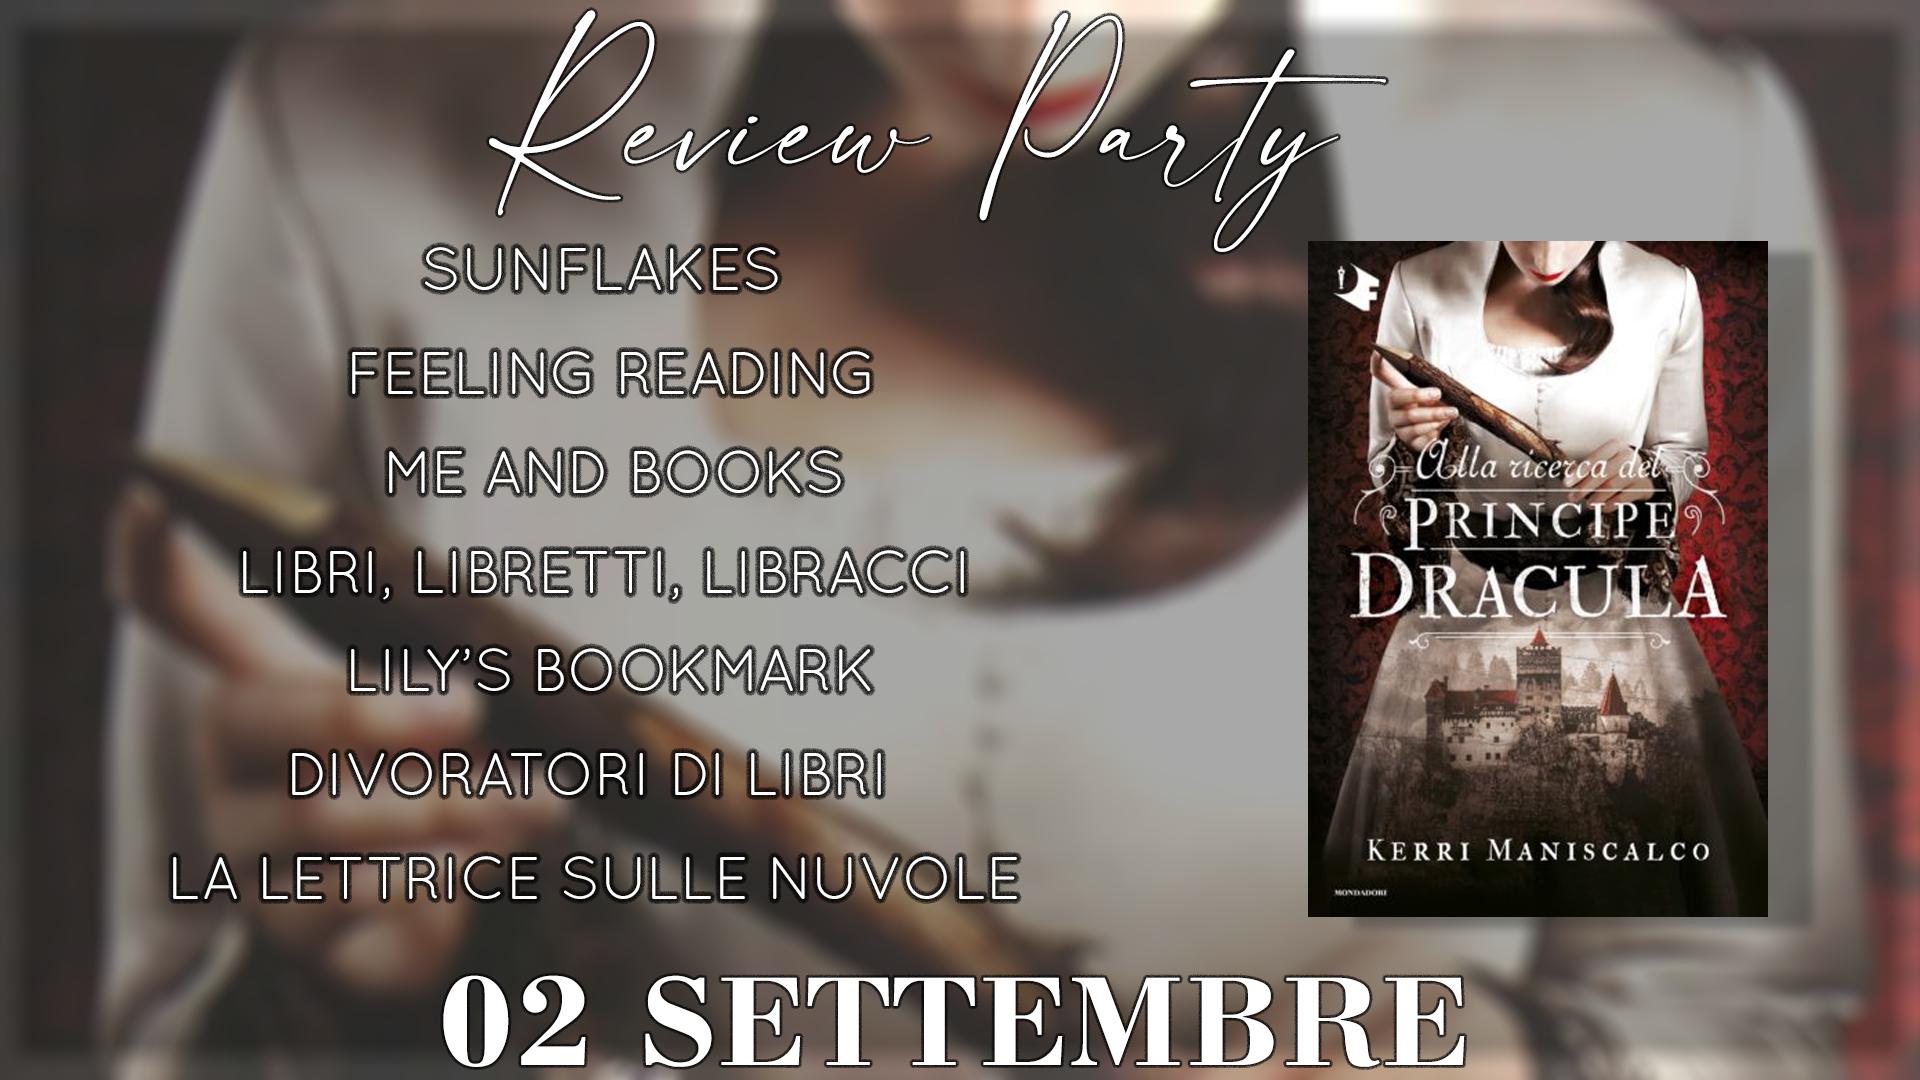 Review Party - Alla ricerca del Principe Dracula di Kerri Maniscalco